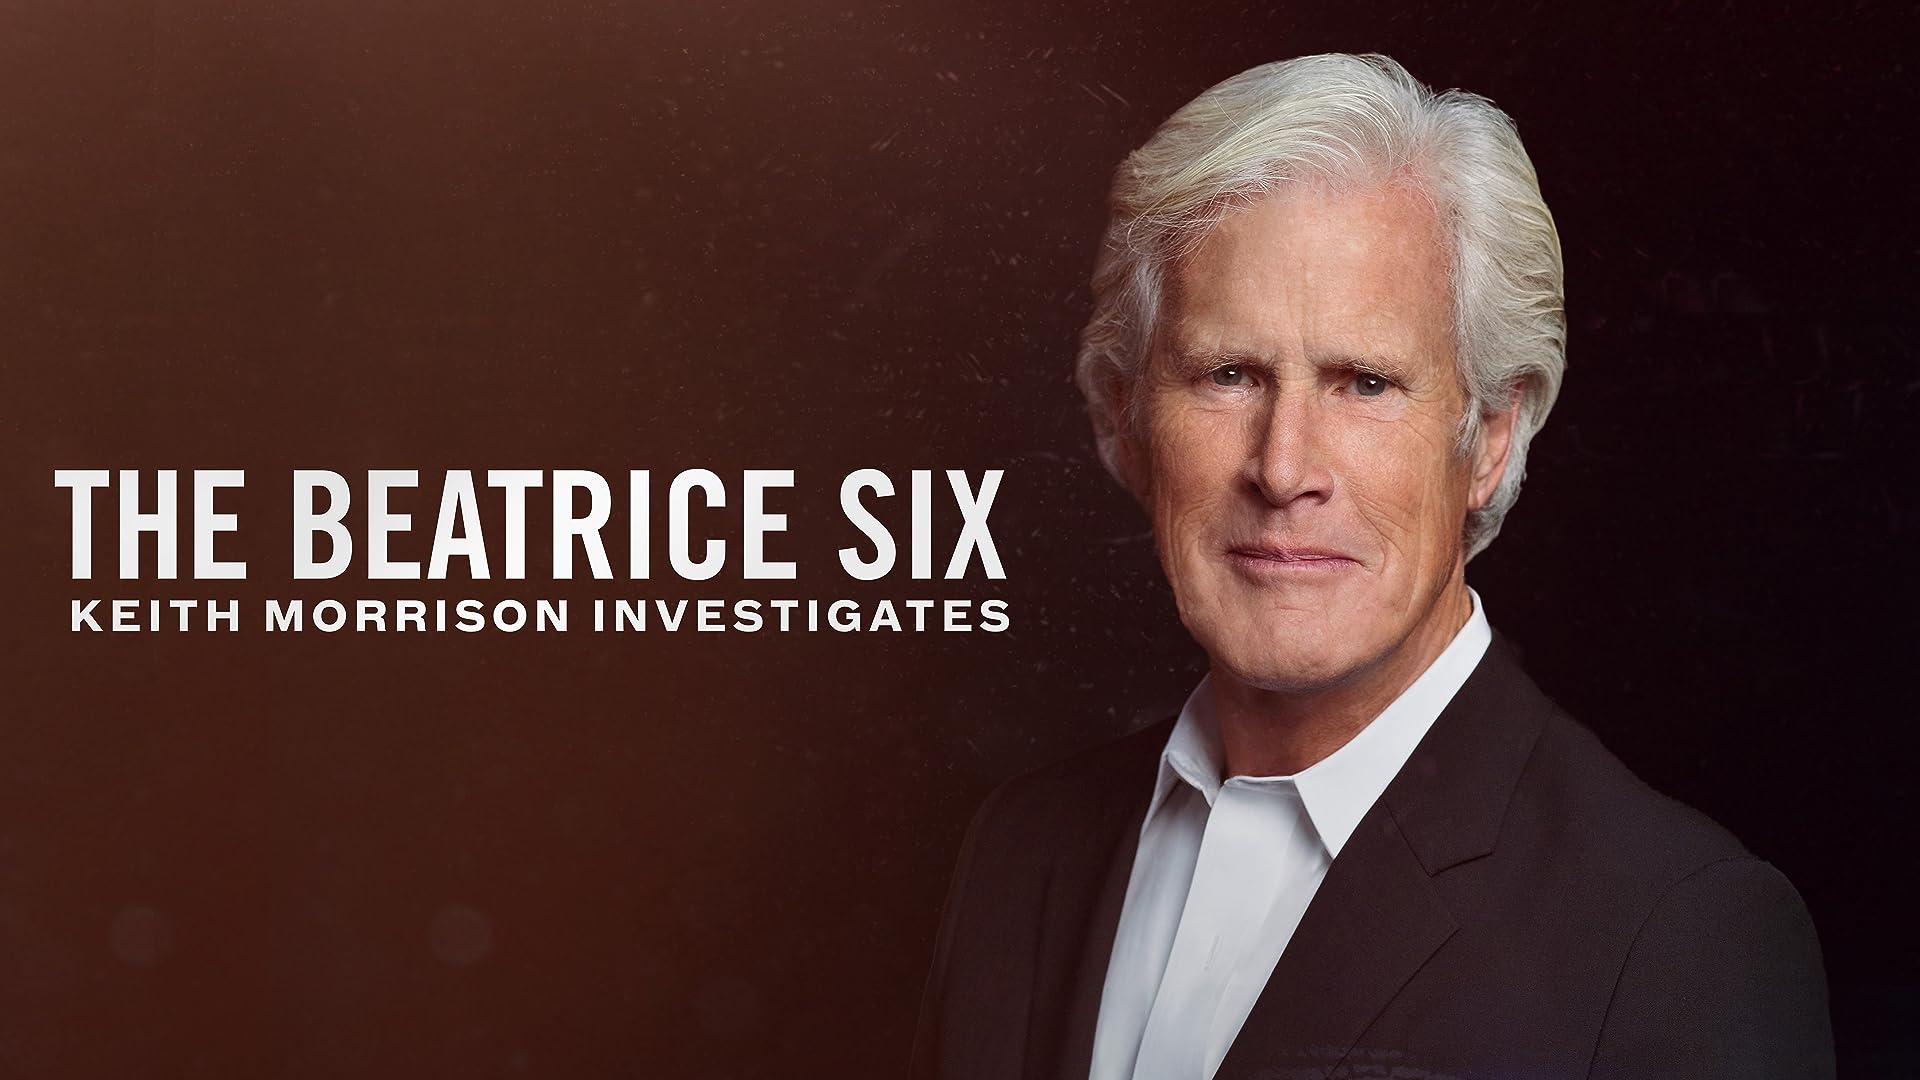 The Beatrice Six: Keith Morrison Investigates - Season 1